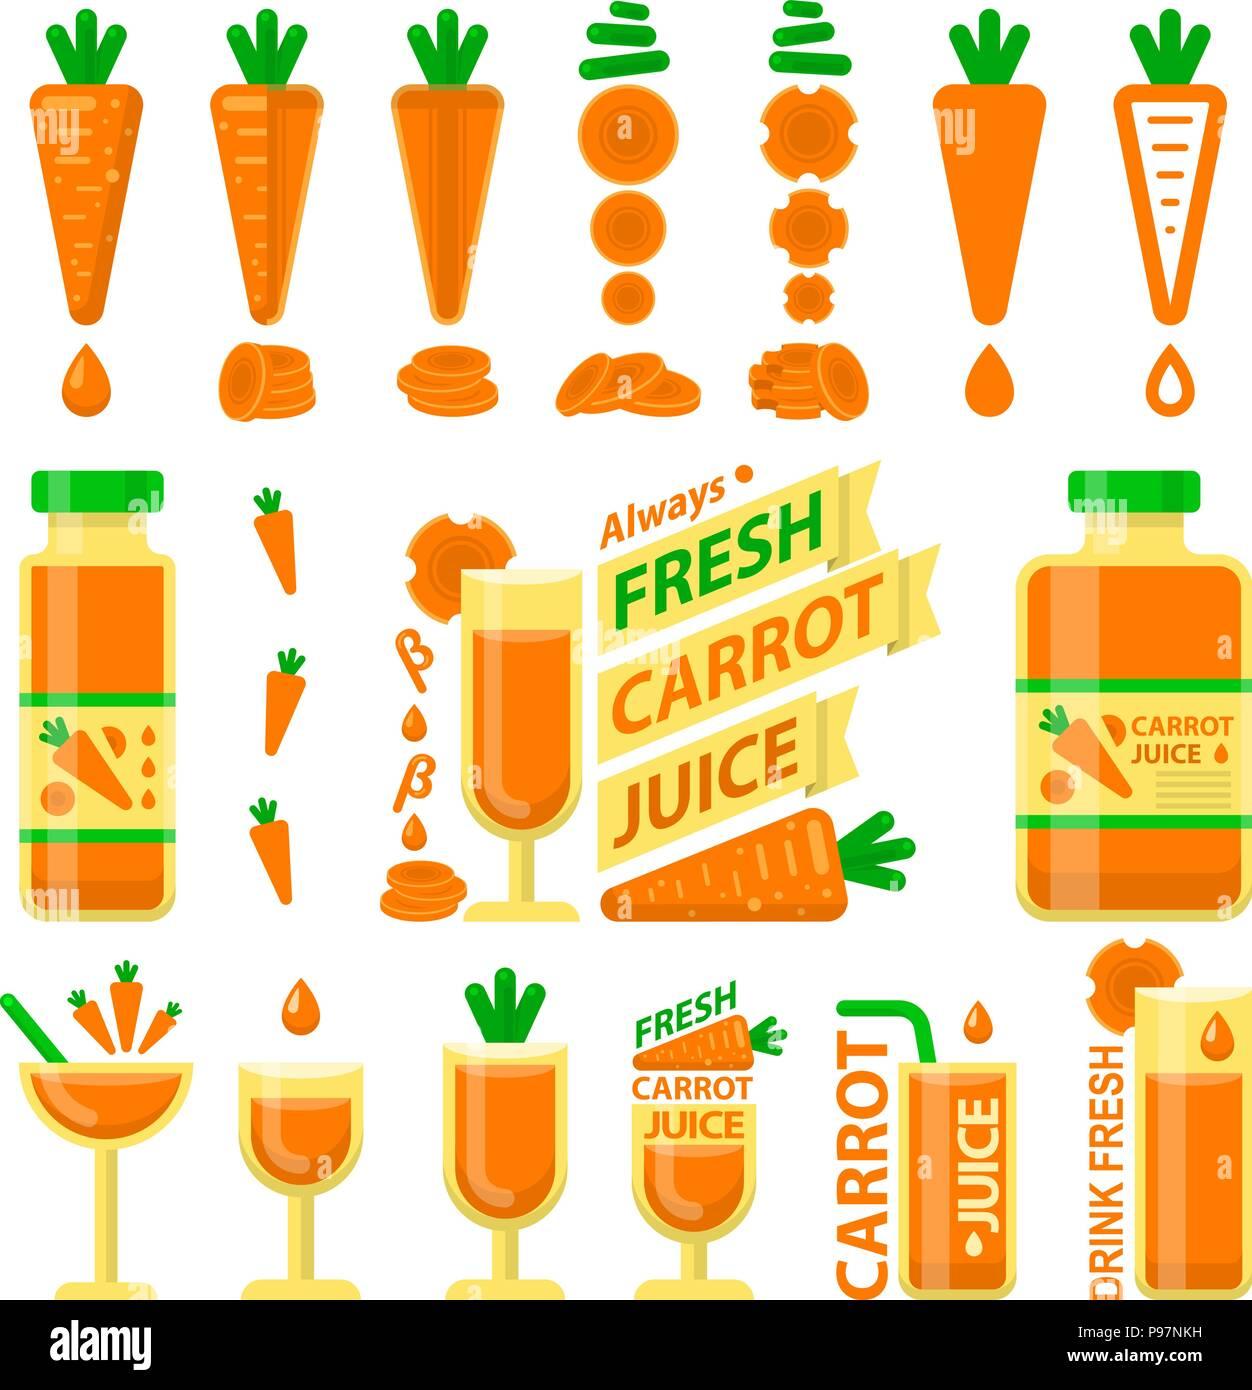 Alpha-carotene Might Help You Live A Longer, Healthier Life! - Us Smart  Publications